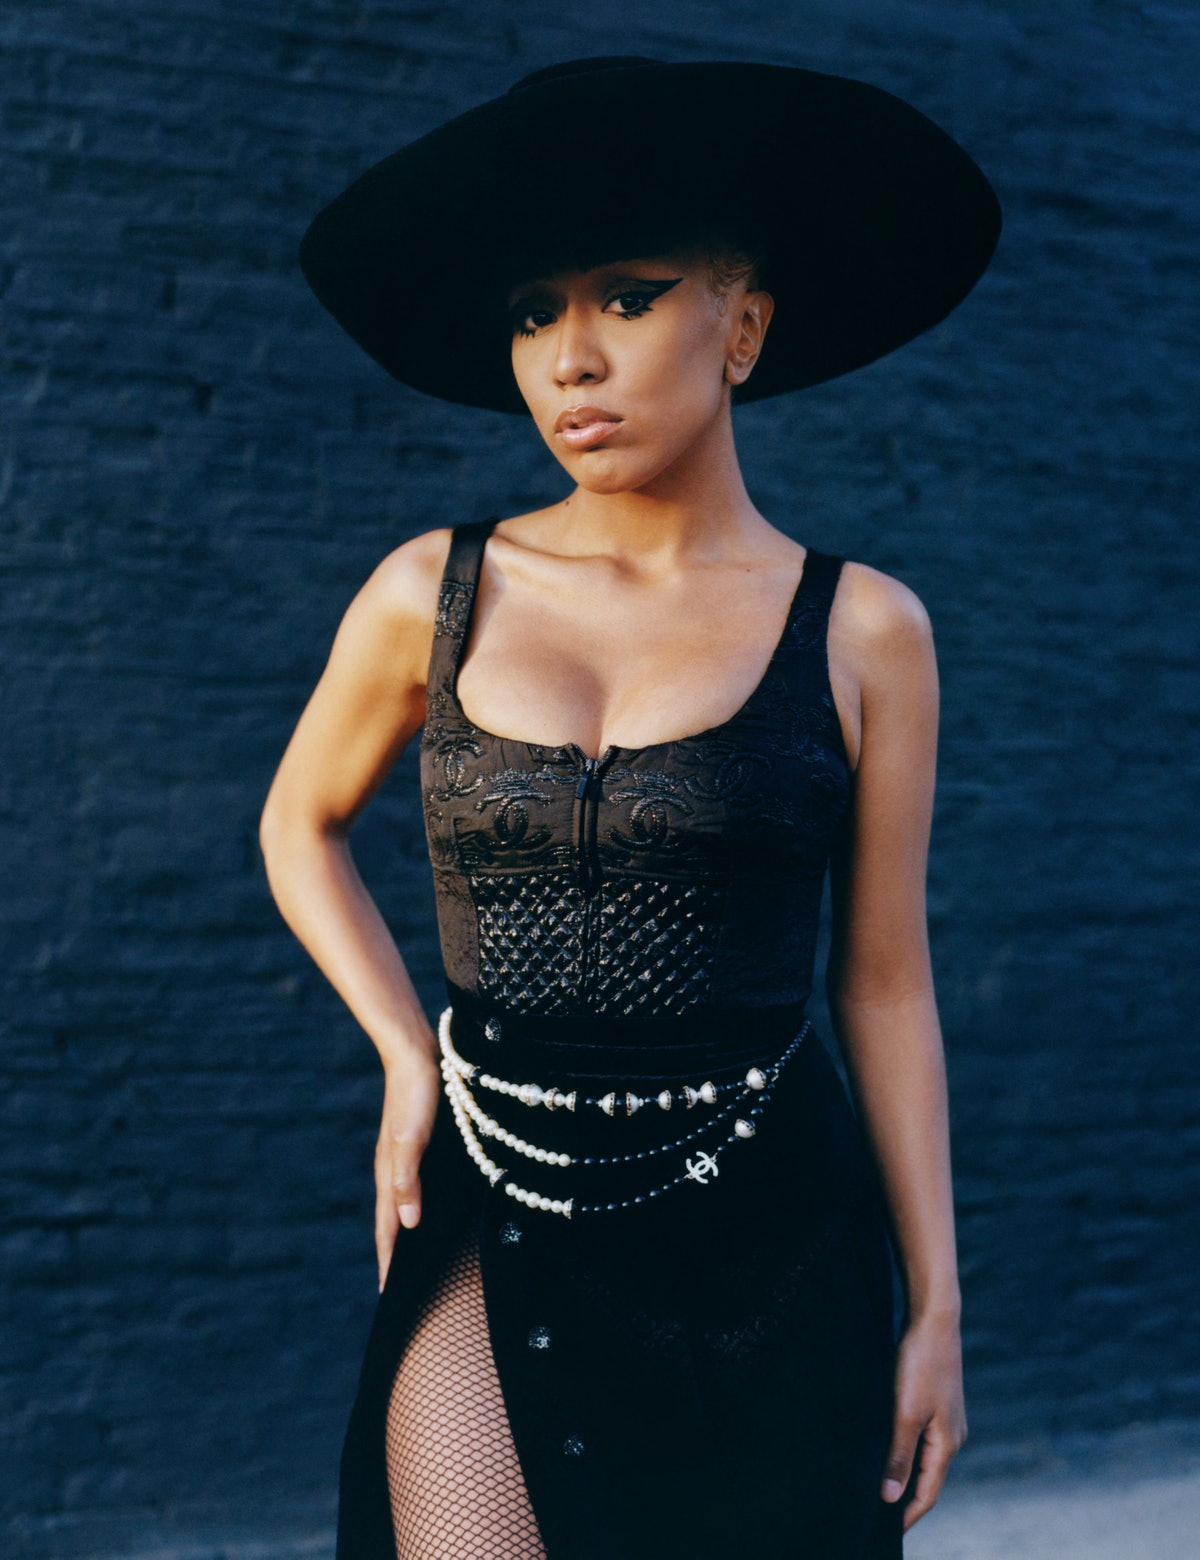 Fousheé wears a Chanel top, skirt, hat, and belt; Capezio fishnets.